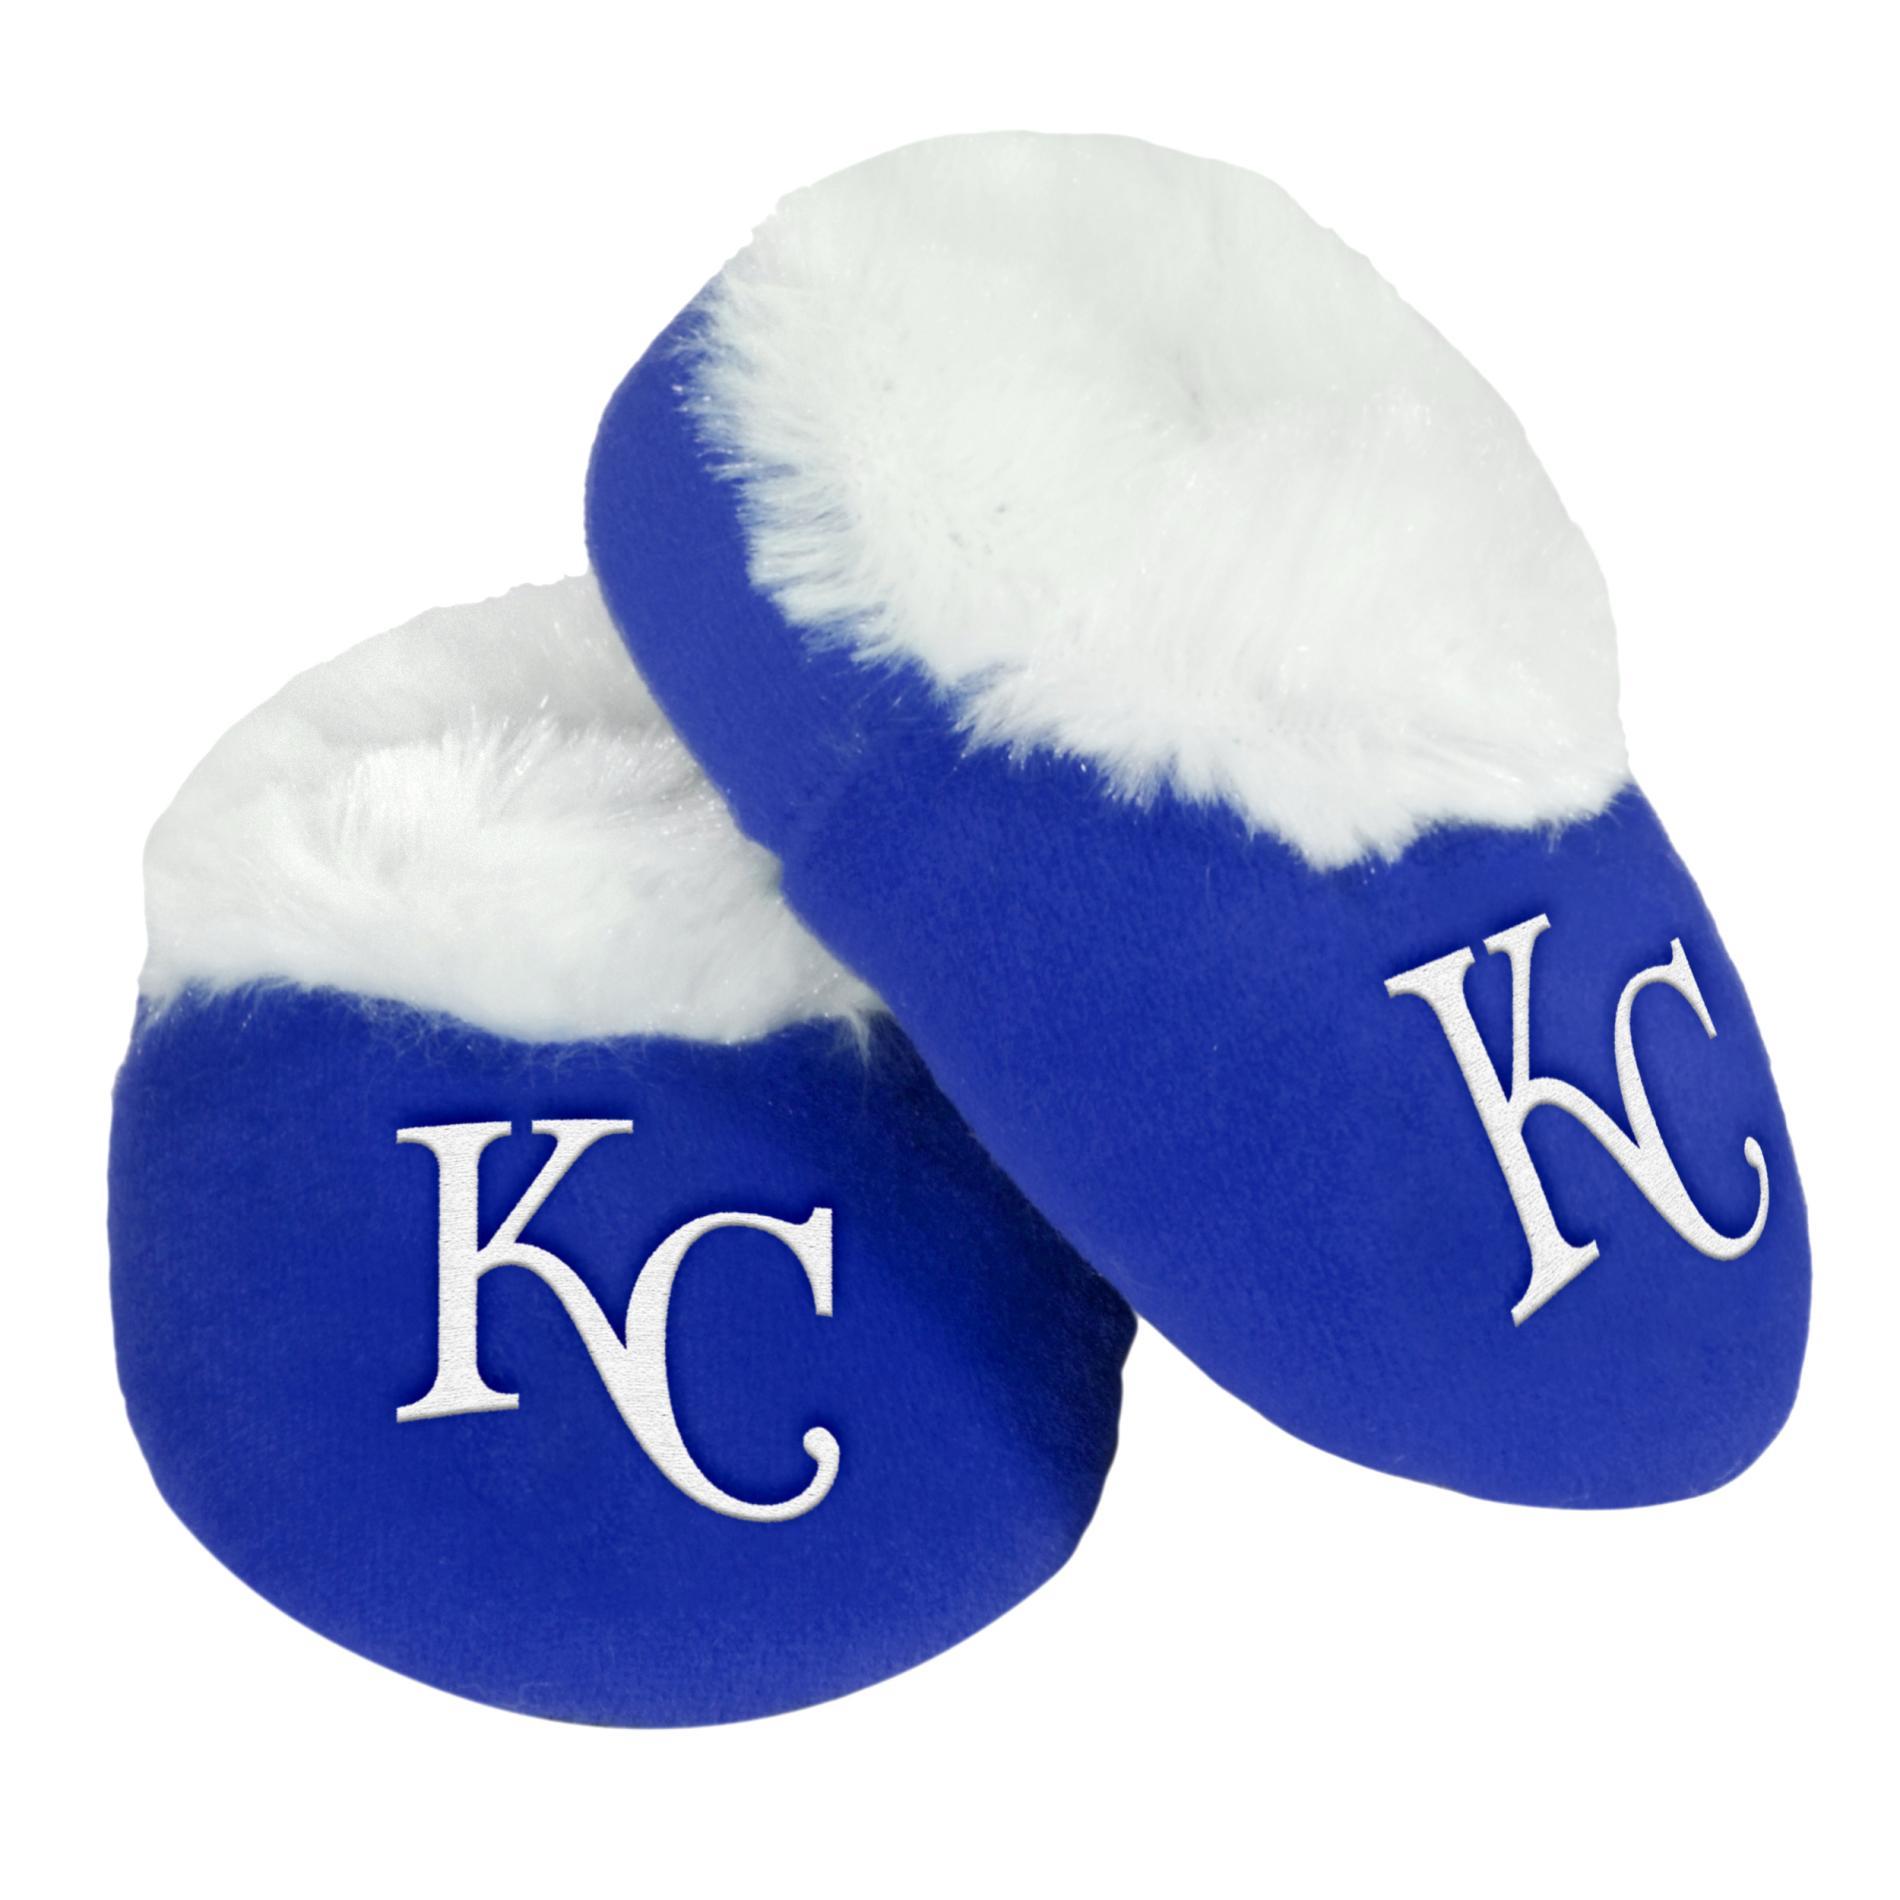 MLB Babies' Kansas City Royals Blue/White Bootie PartNumber: 046VA92337912P MfgPartNumber: SLPMBBBYBTSGXL